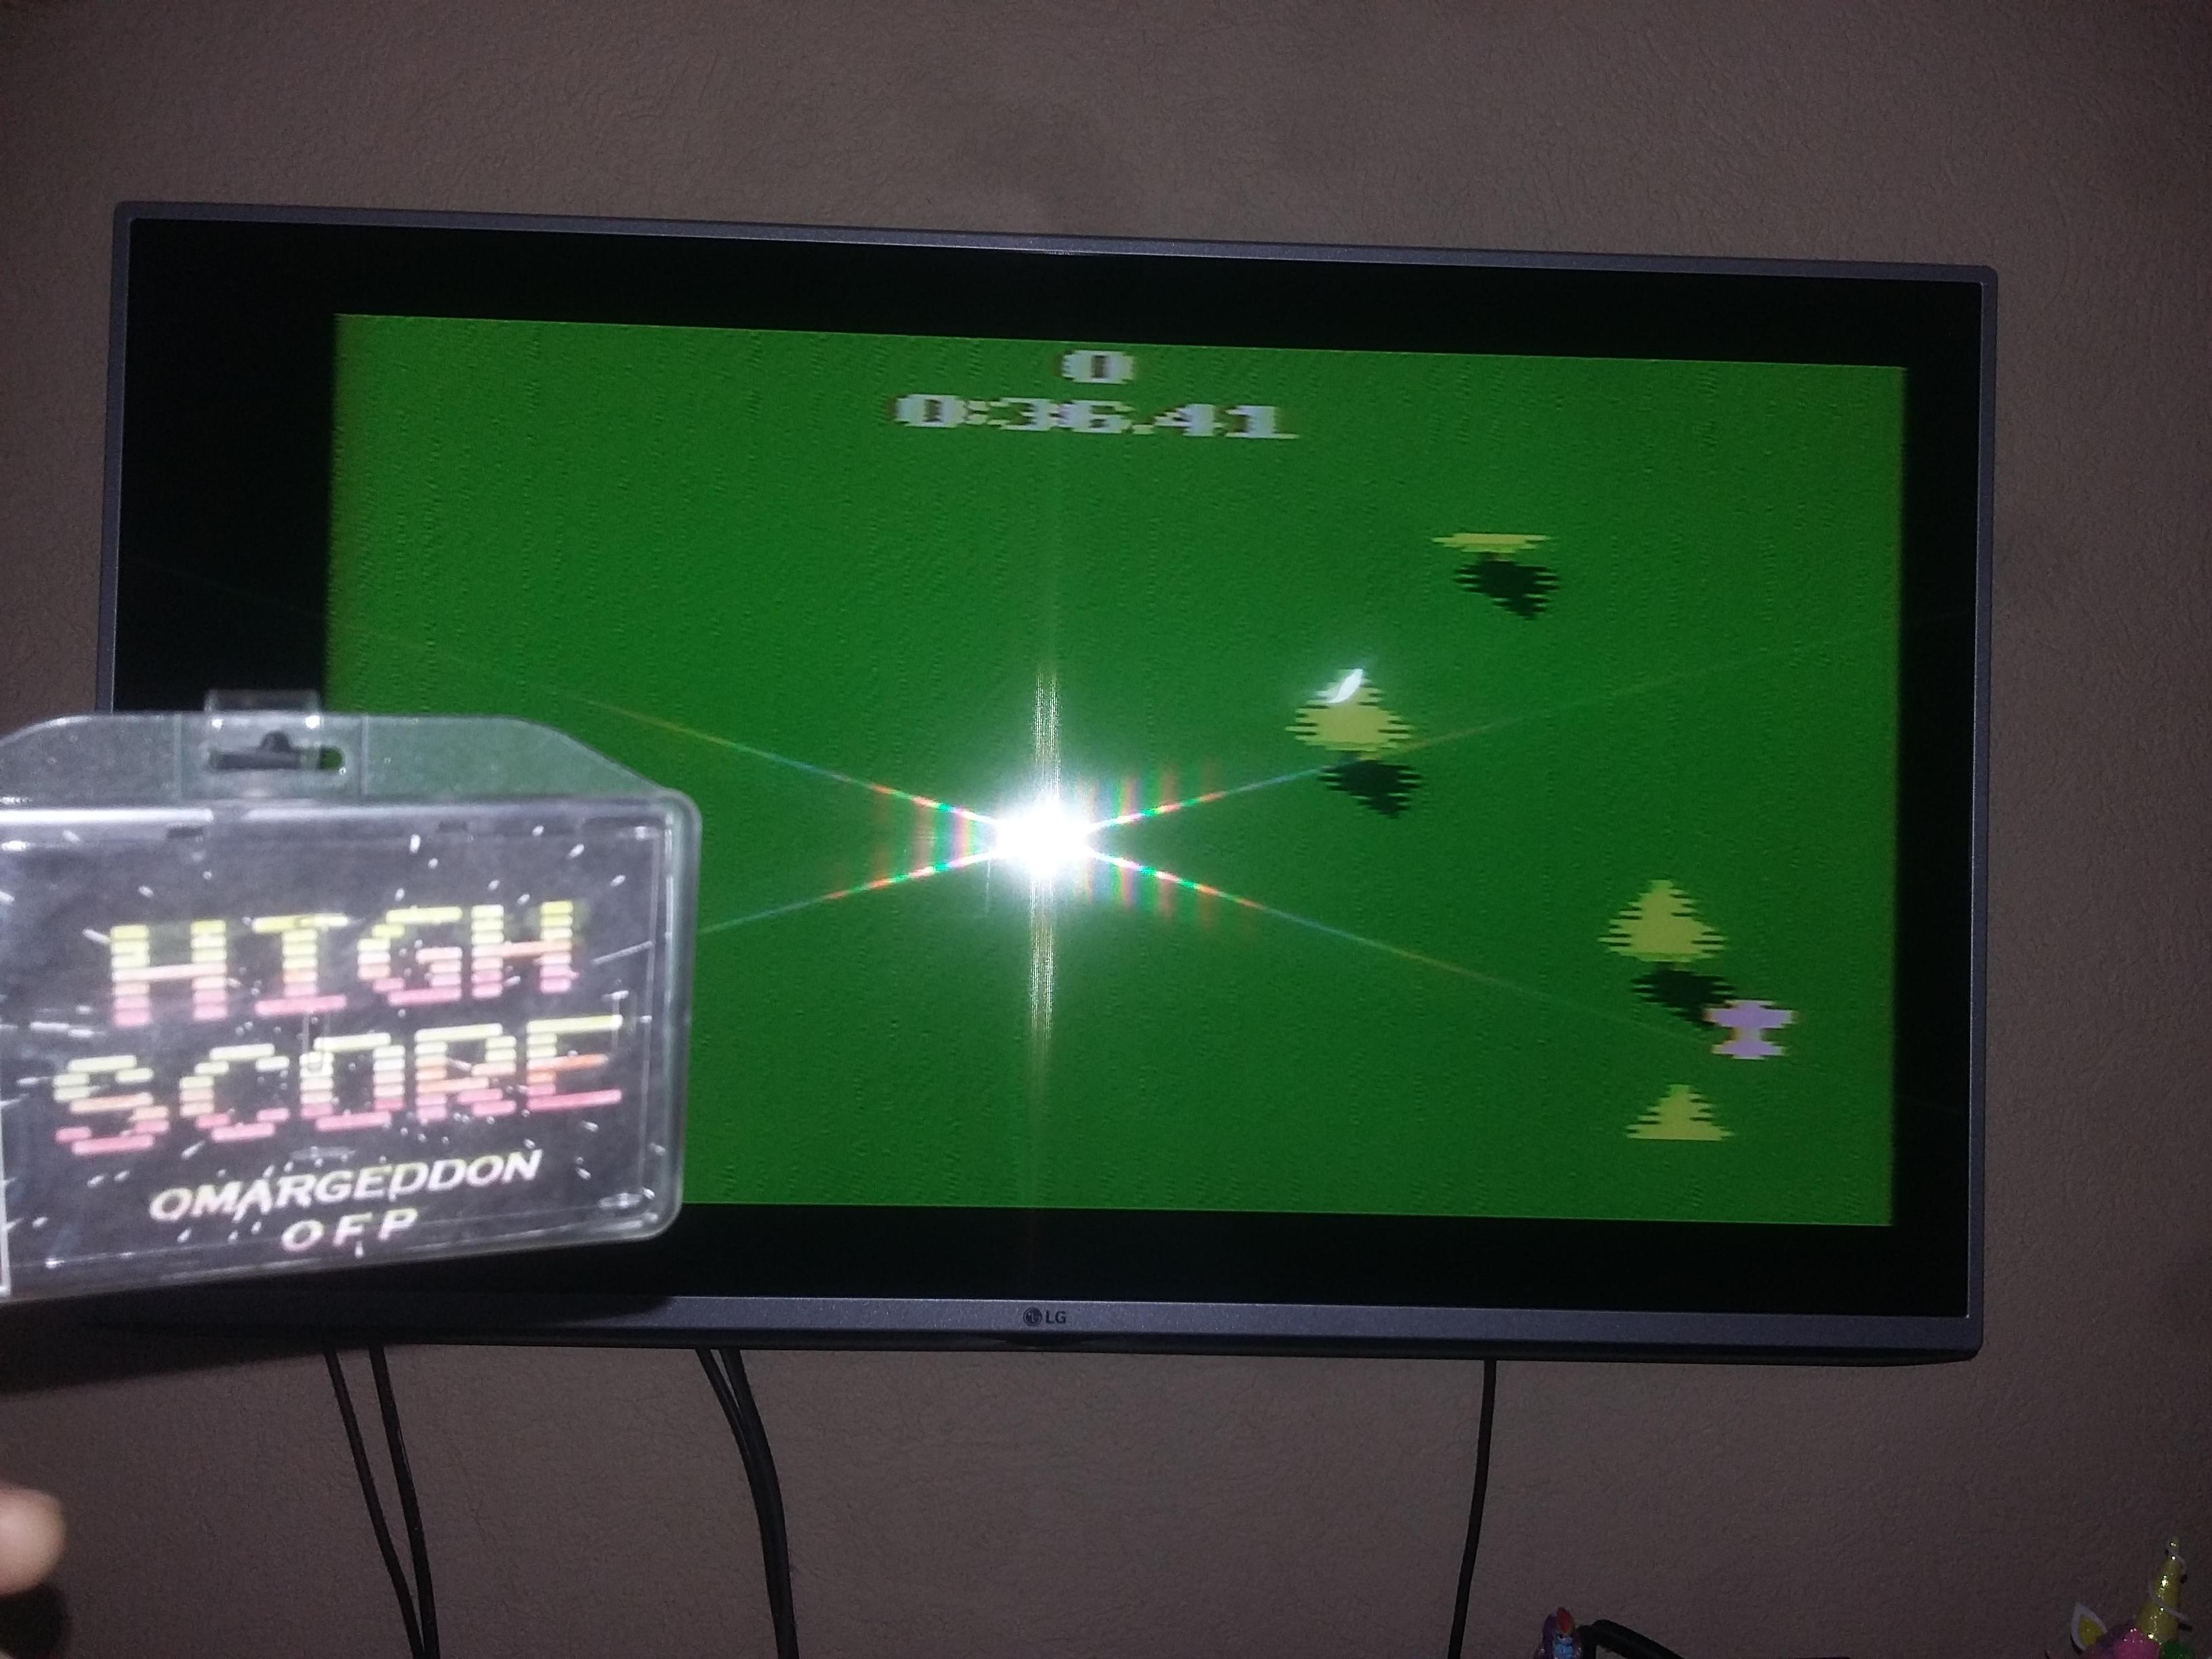 omargeddon: Sky Jinks (Atari 2600 Novice/B) 0:00:36.41 points on 2018-03-02 18:28:17